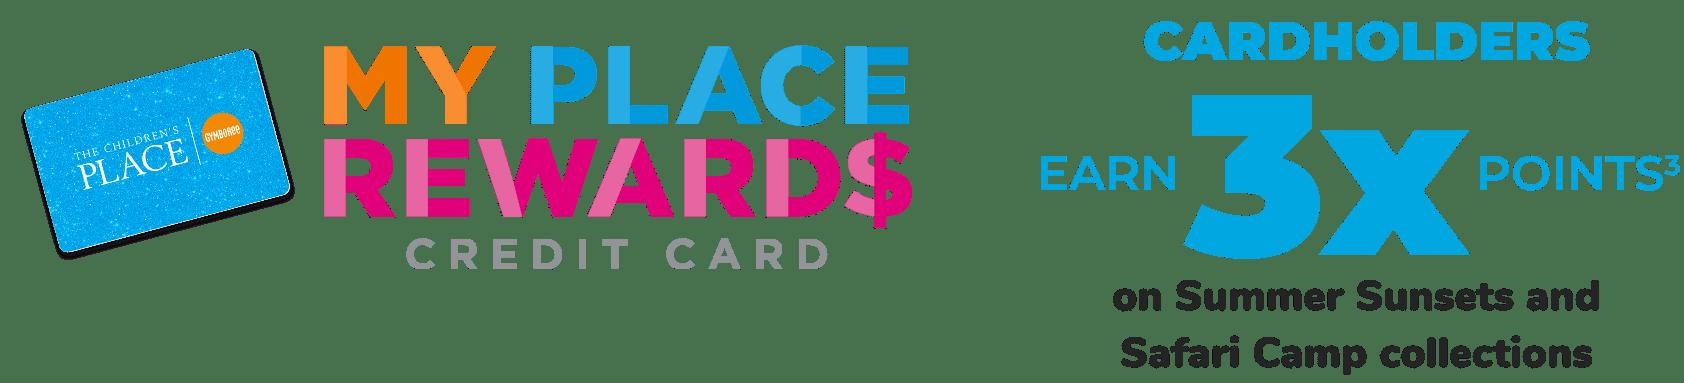 My Place Rewards Credit Card